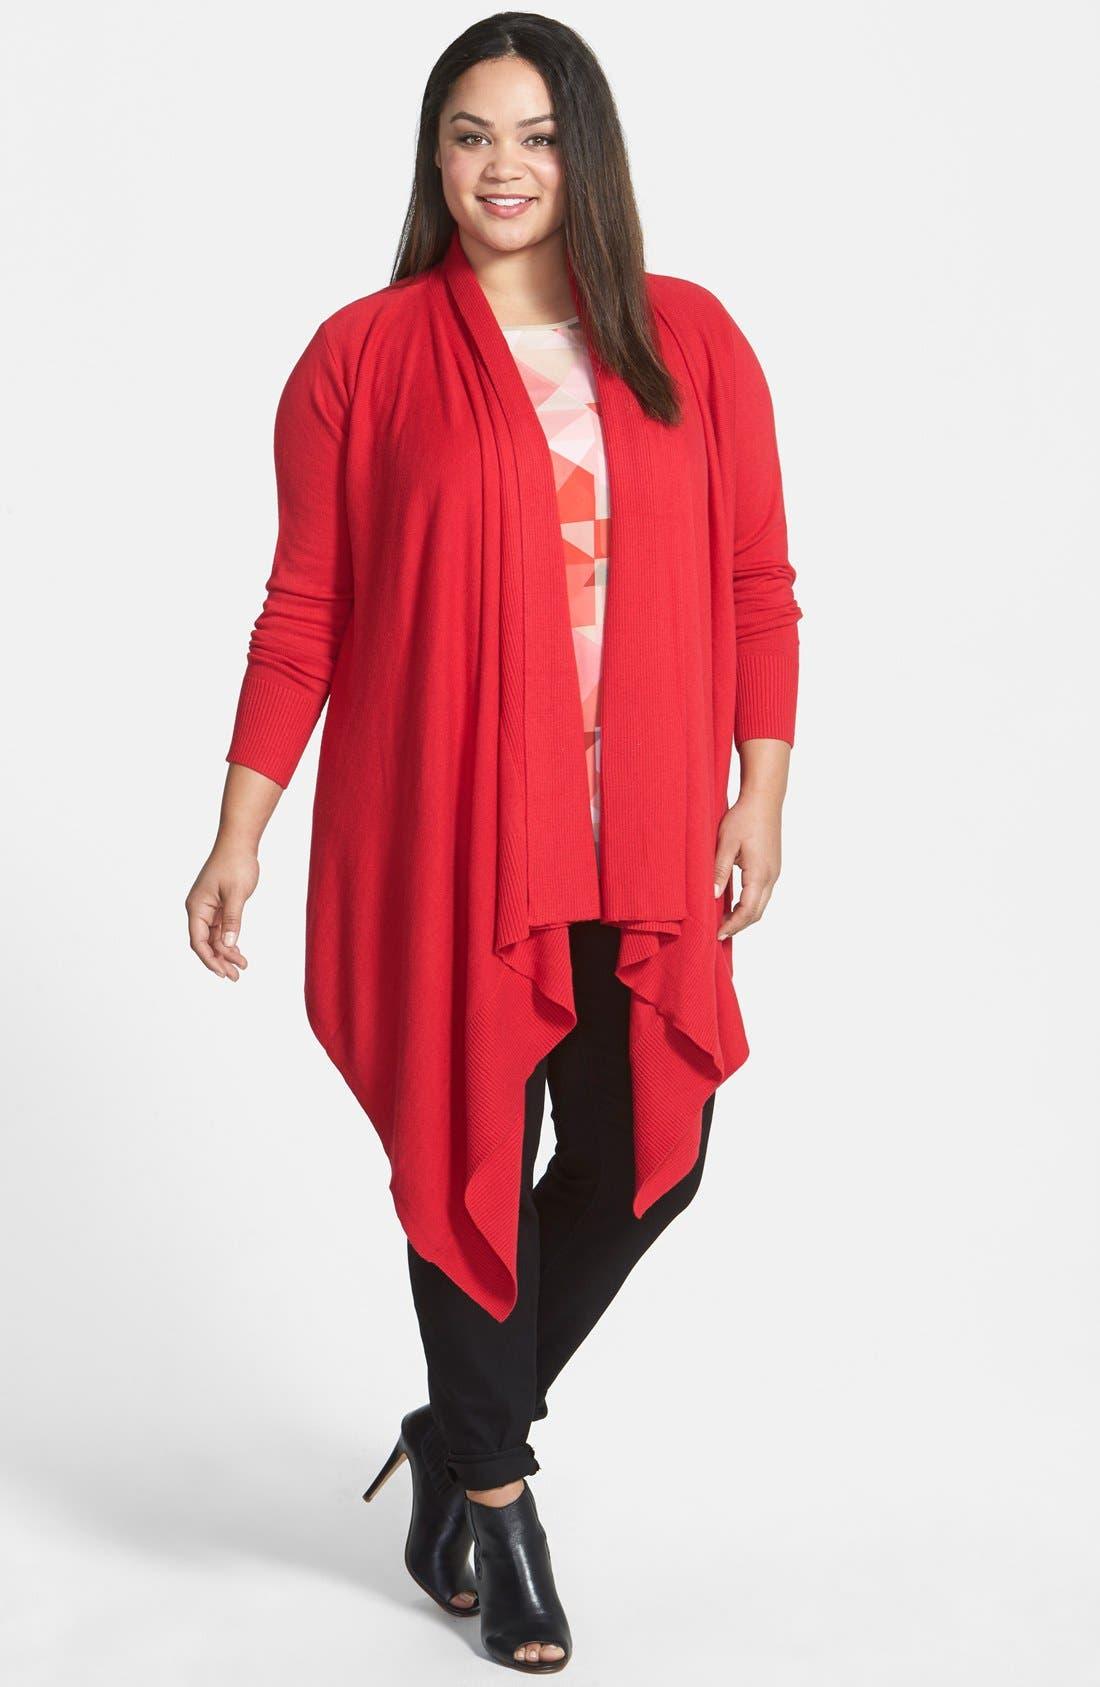 Alternate Image 1 Selected - DKNYC Oversize Drape Front Cardigan (Plus Size)